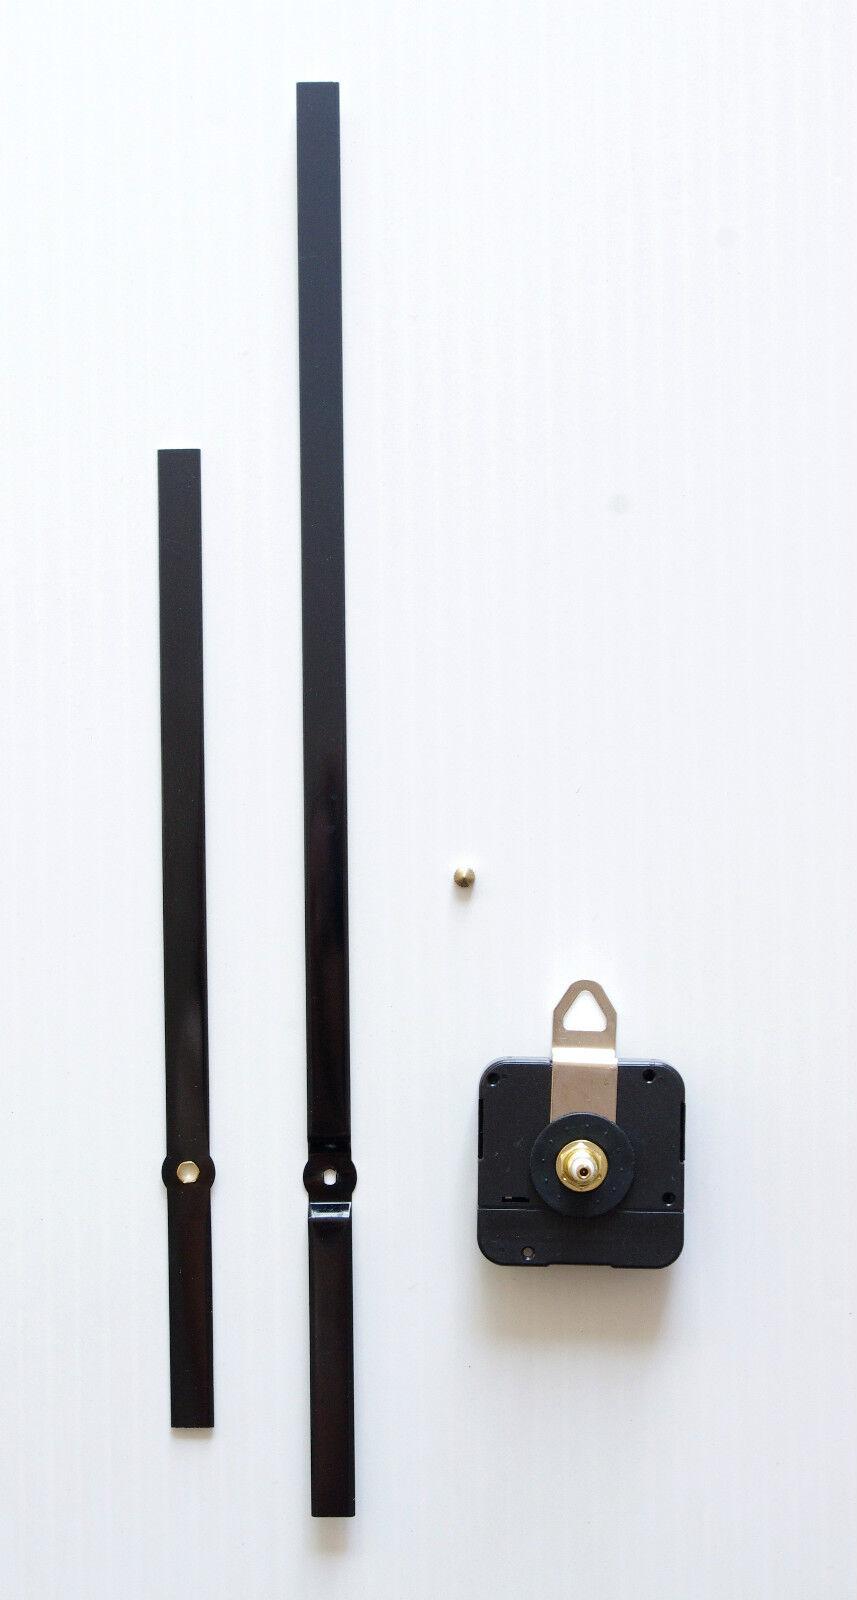 m canisme horloge quartz grandes aiguilles droites extra longues xxl 20 30cm eur 24 00. Black Bedroom Furniture Sets. Home Design Ideas